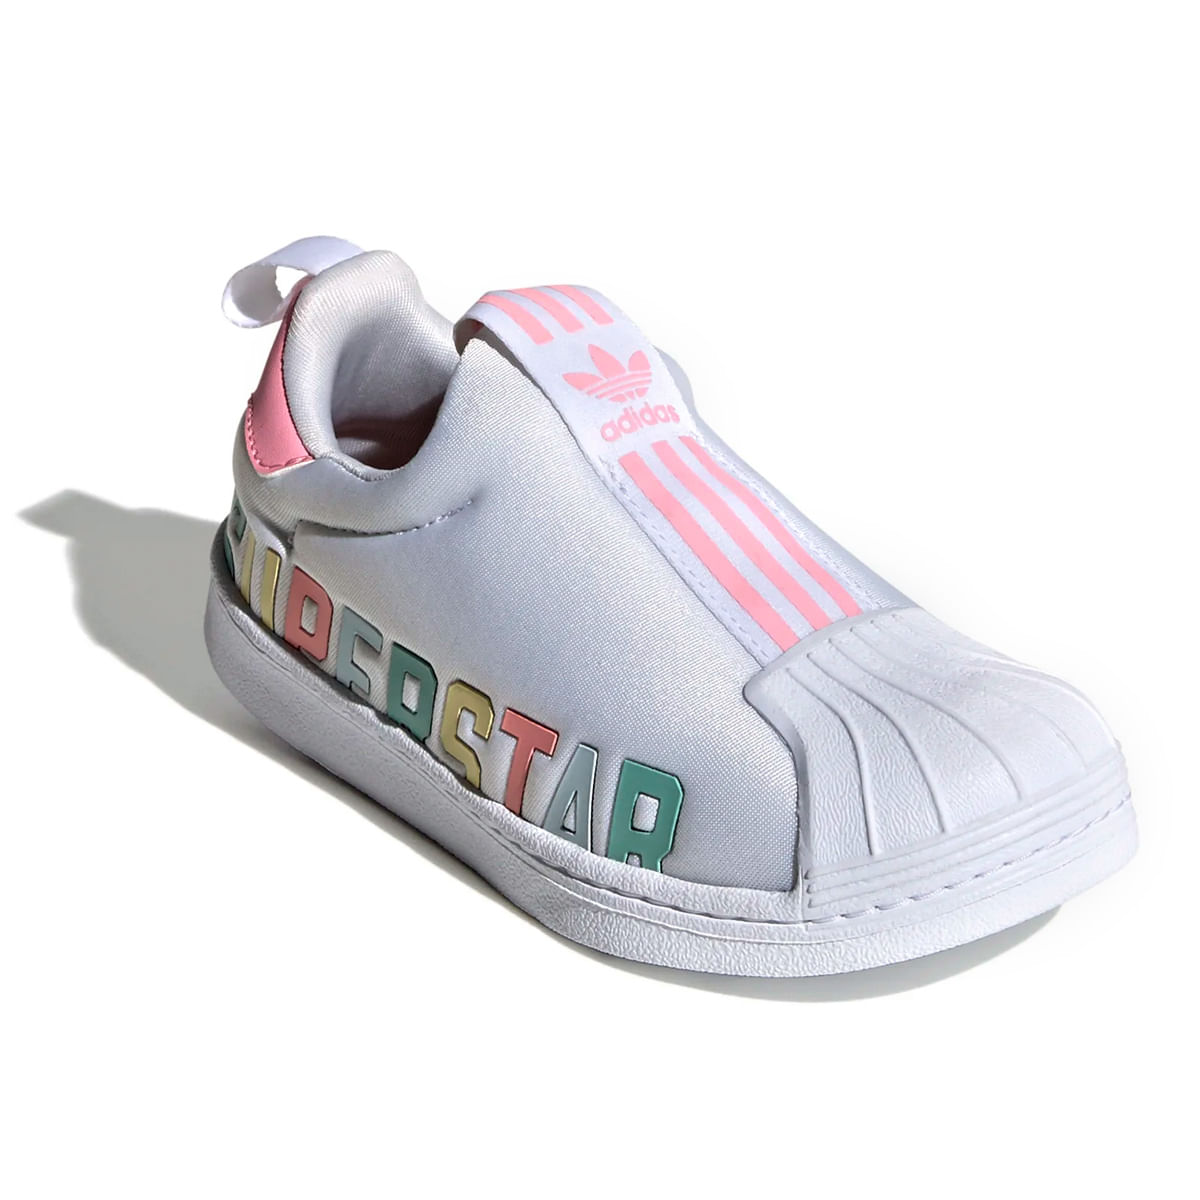 Tenis-Infantil-Menina-Adidas-Superstar-360-X-C--26-ao-32---PRE-VENDA-